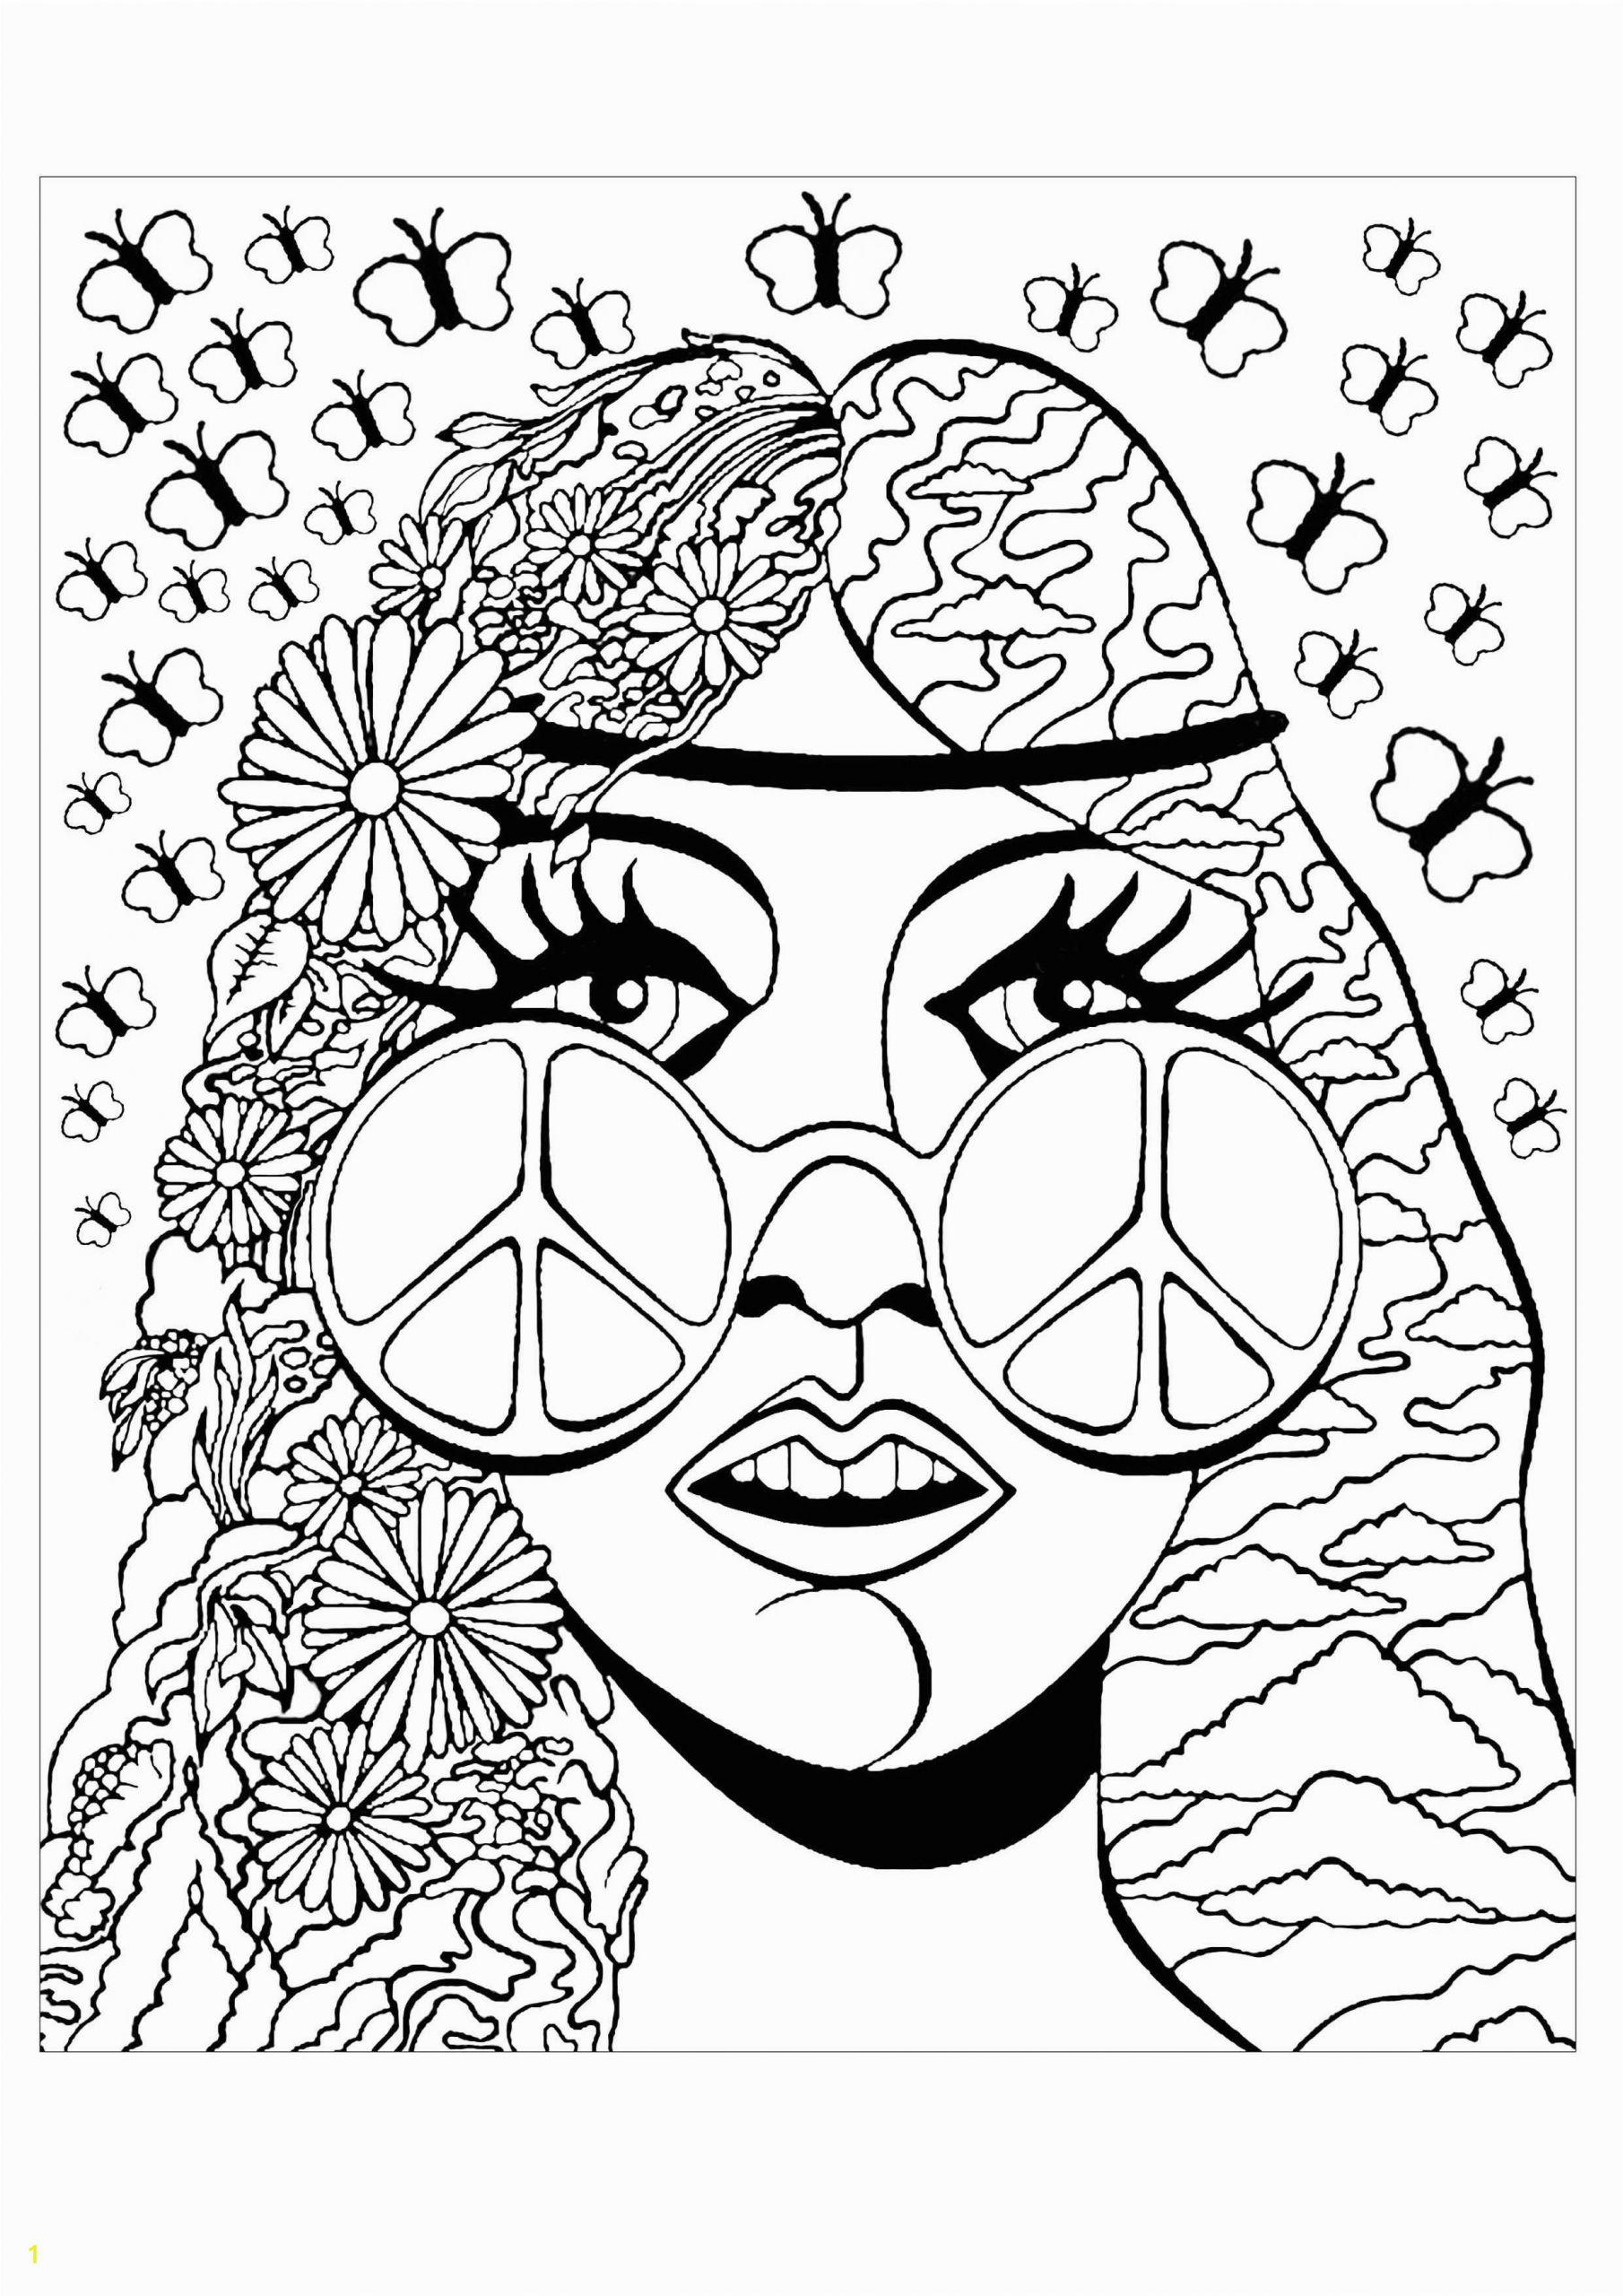 Unique Bohemian Coloring Pages for Adults Psychedelic Girl butterflies Psychedelic Coloring Pages